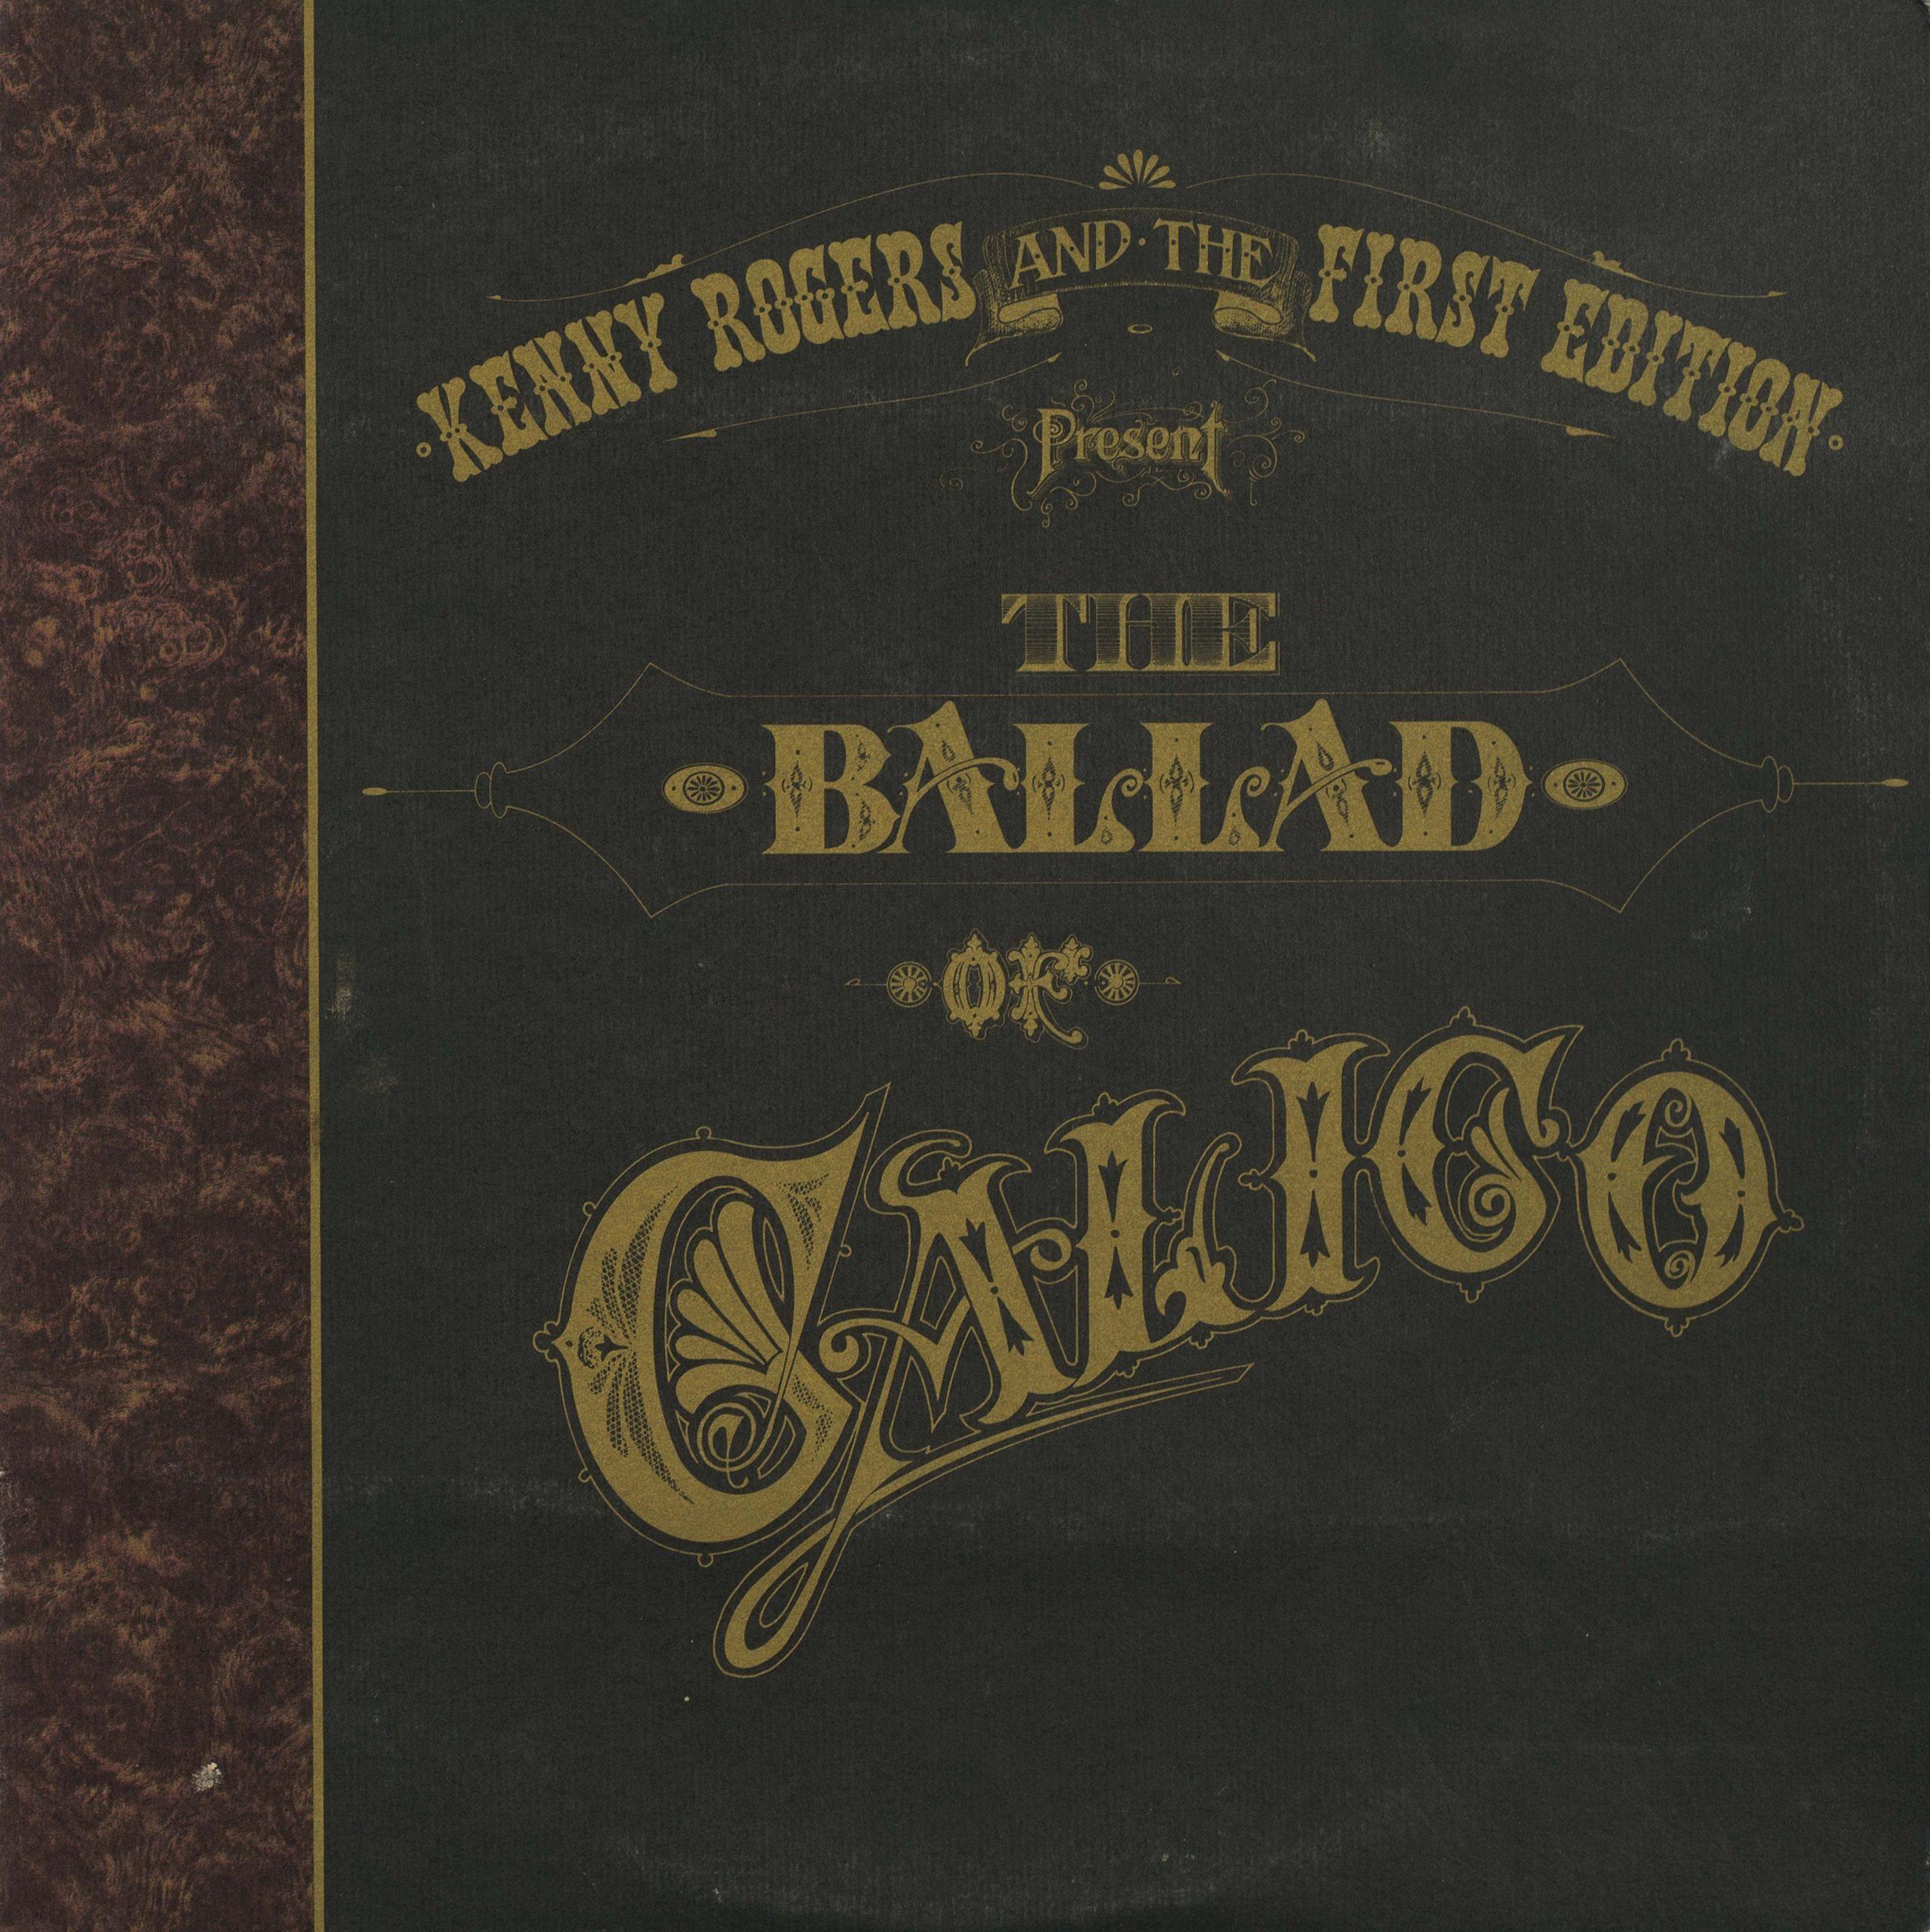 The Ballad of Calico